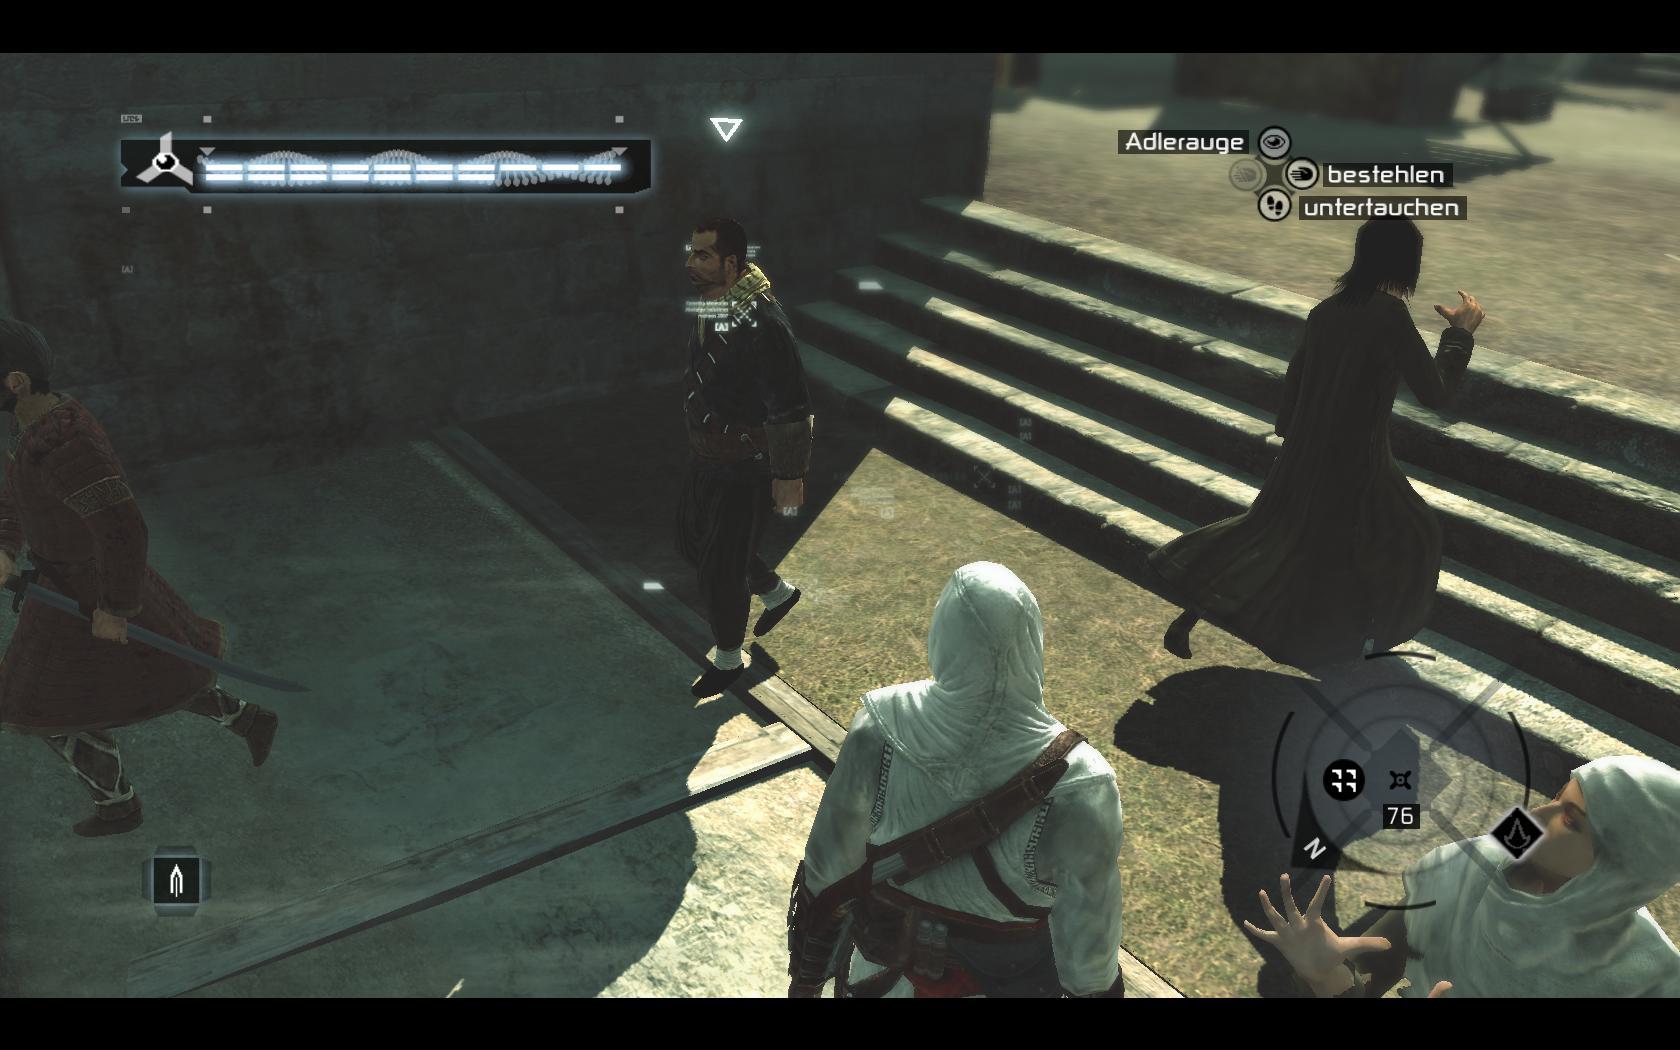 assassinscreed_dx10_2008_04_17_20_15_02_33